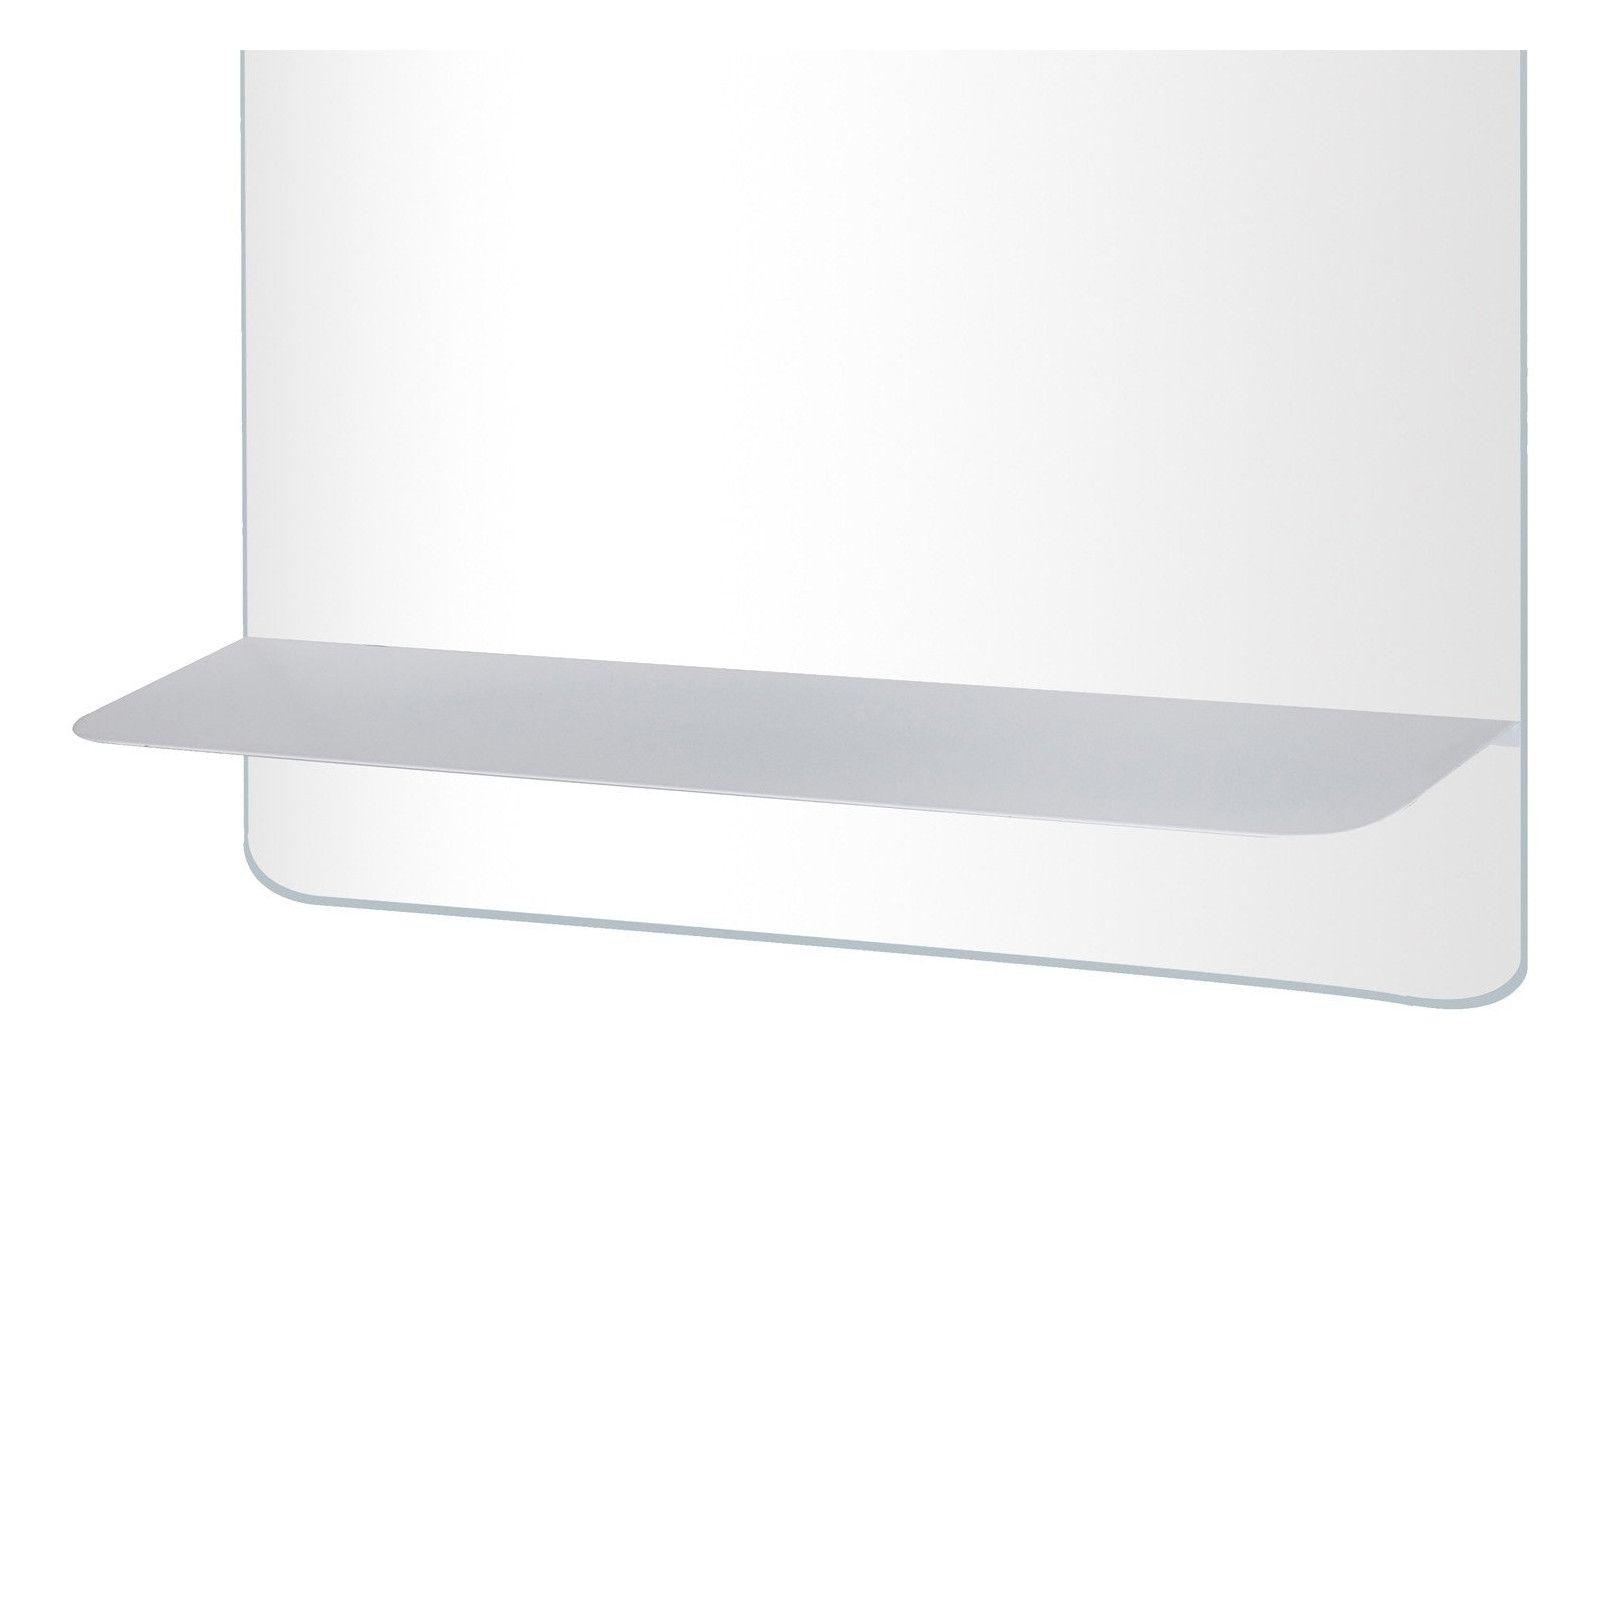 Ensemble de Salle de Bain WILL - Plan suspendu 120 cm + Equerres invisibles + 2 Vasques + 2 Miroirs